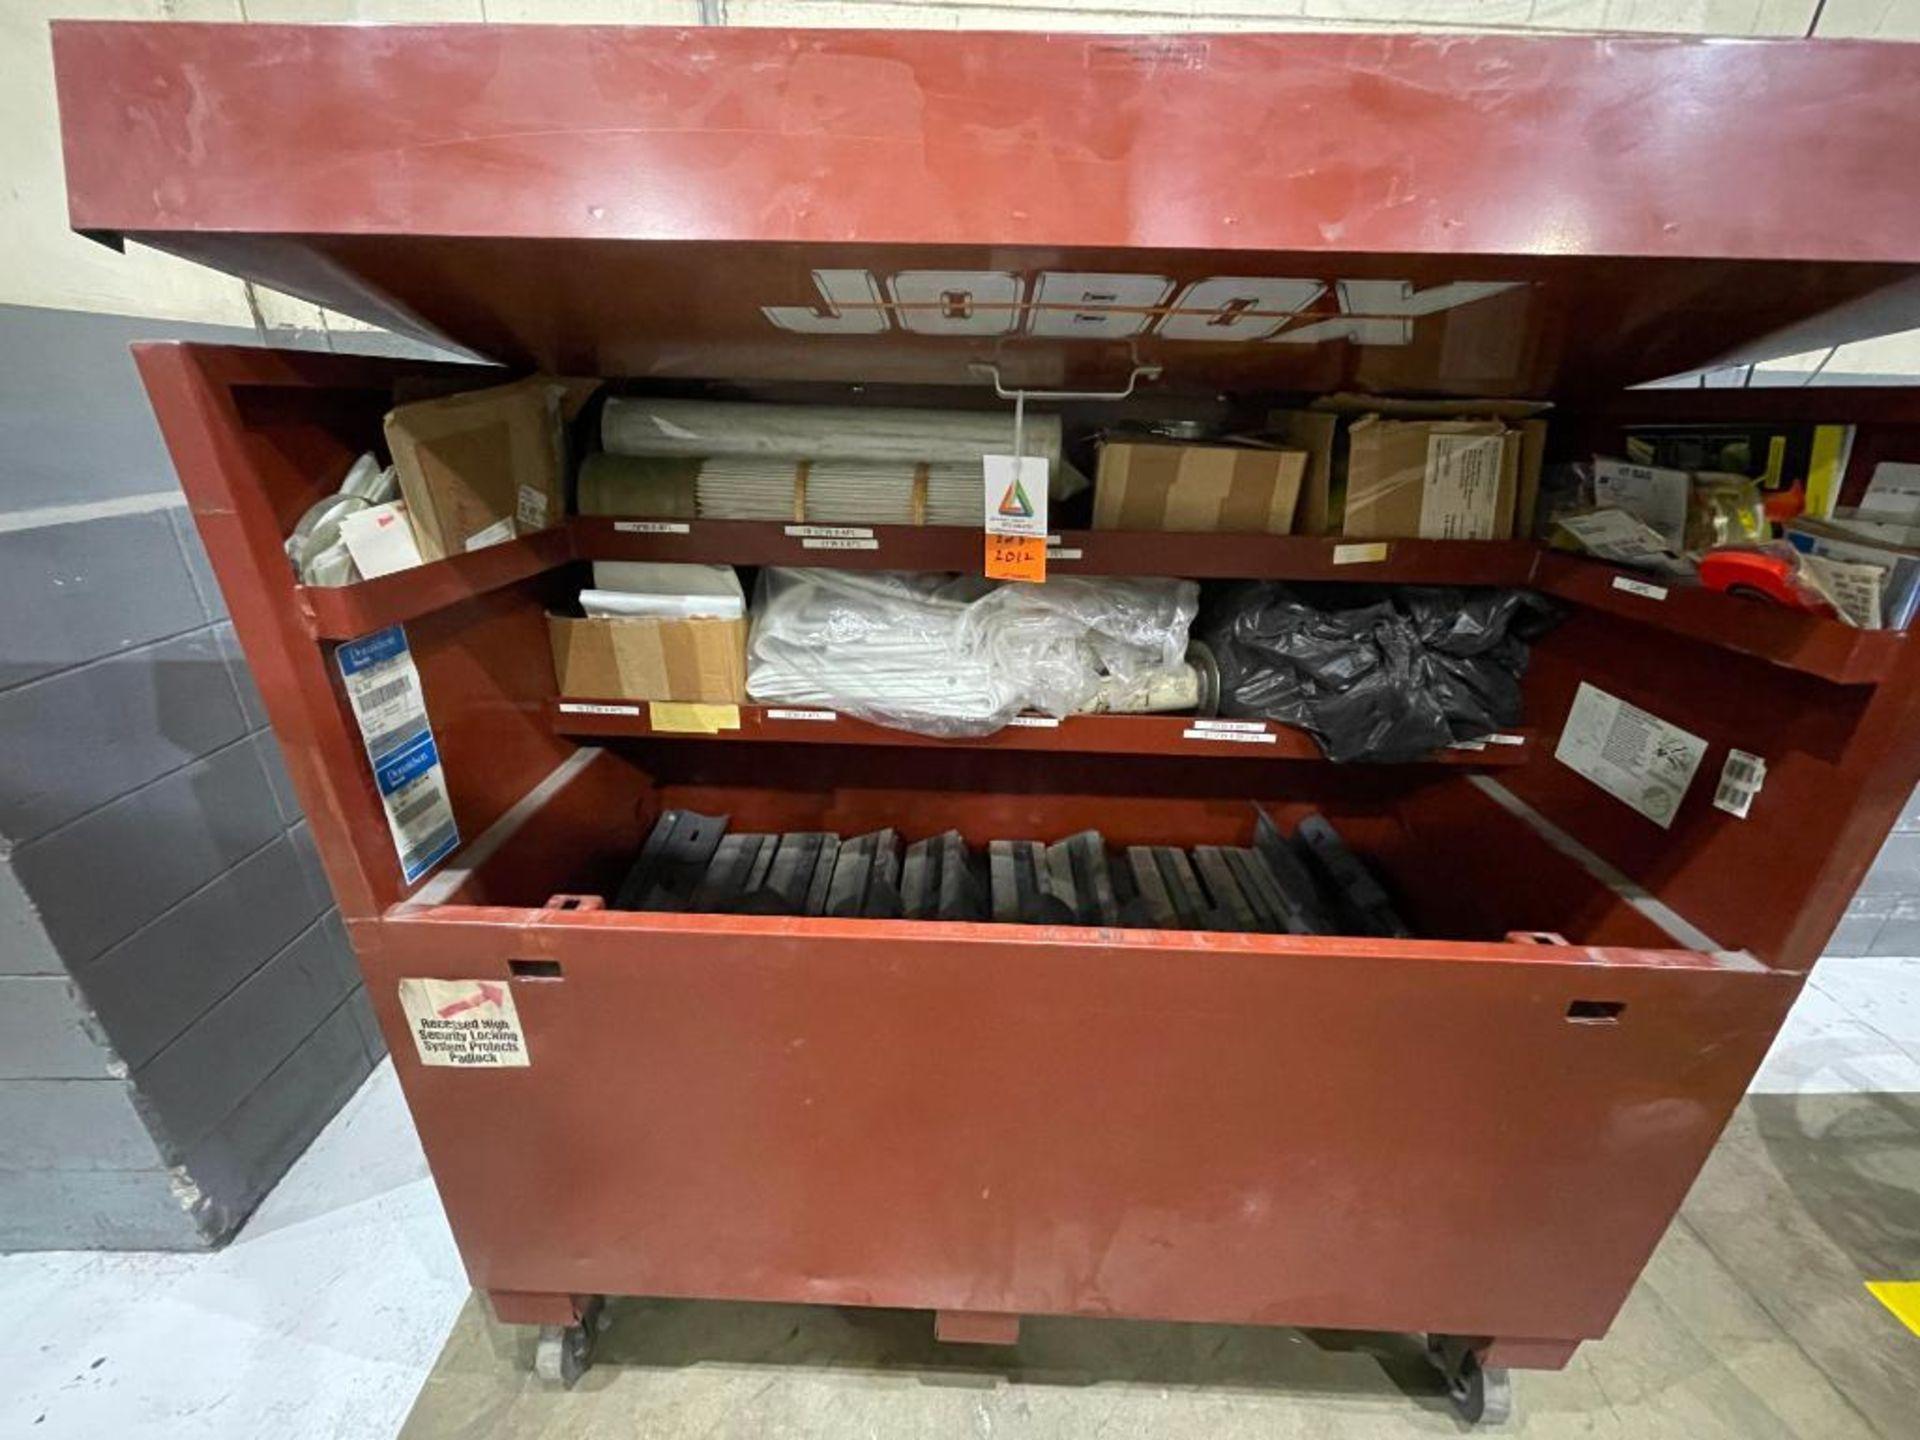 Hayes Machine Co. long goods cartoner, model 51BB - Image 29 of 64